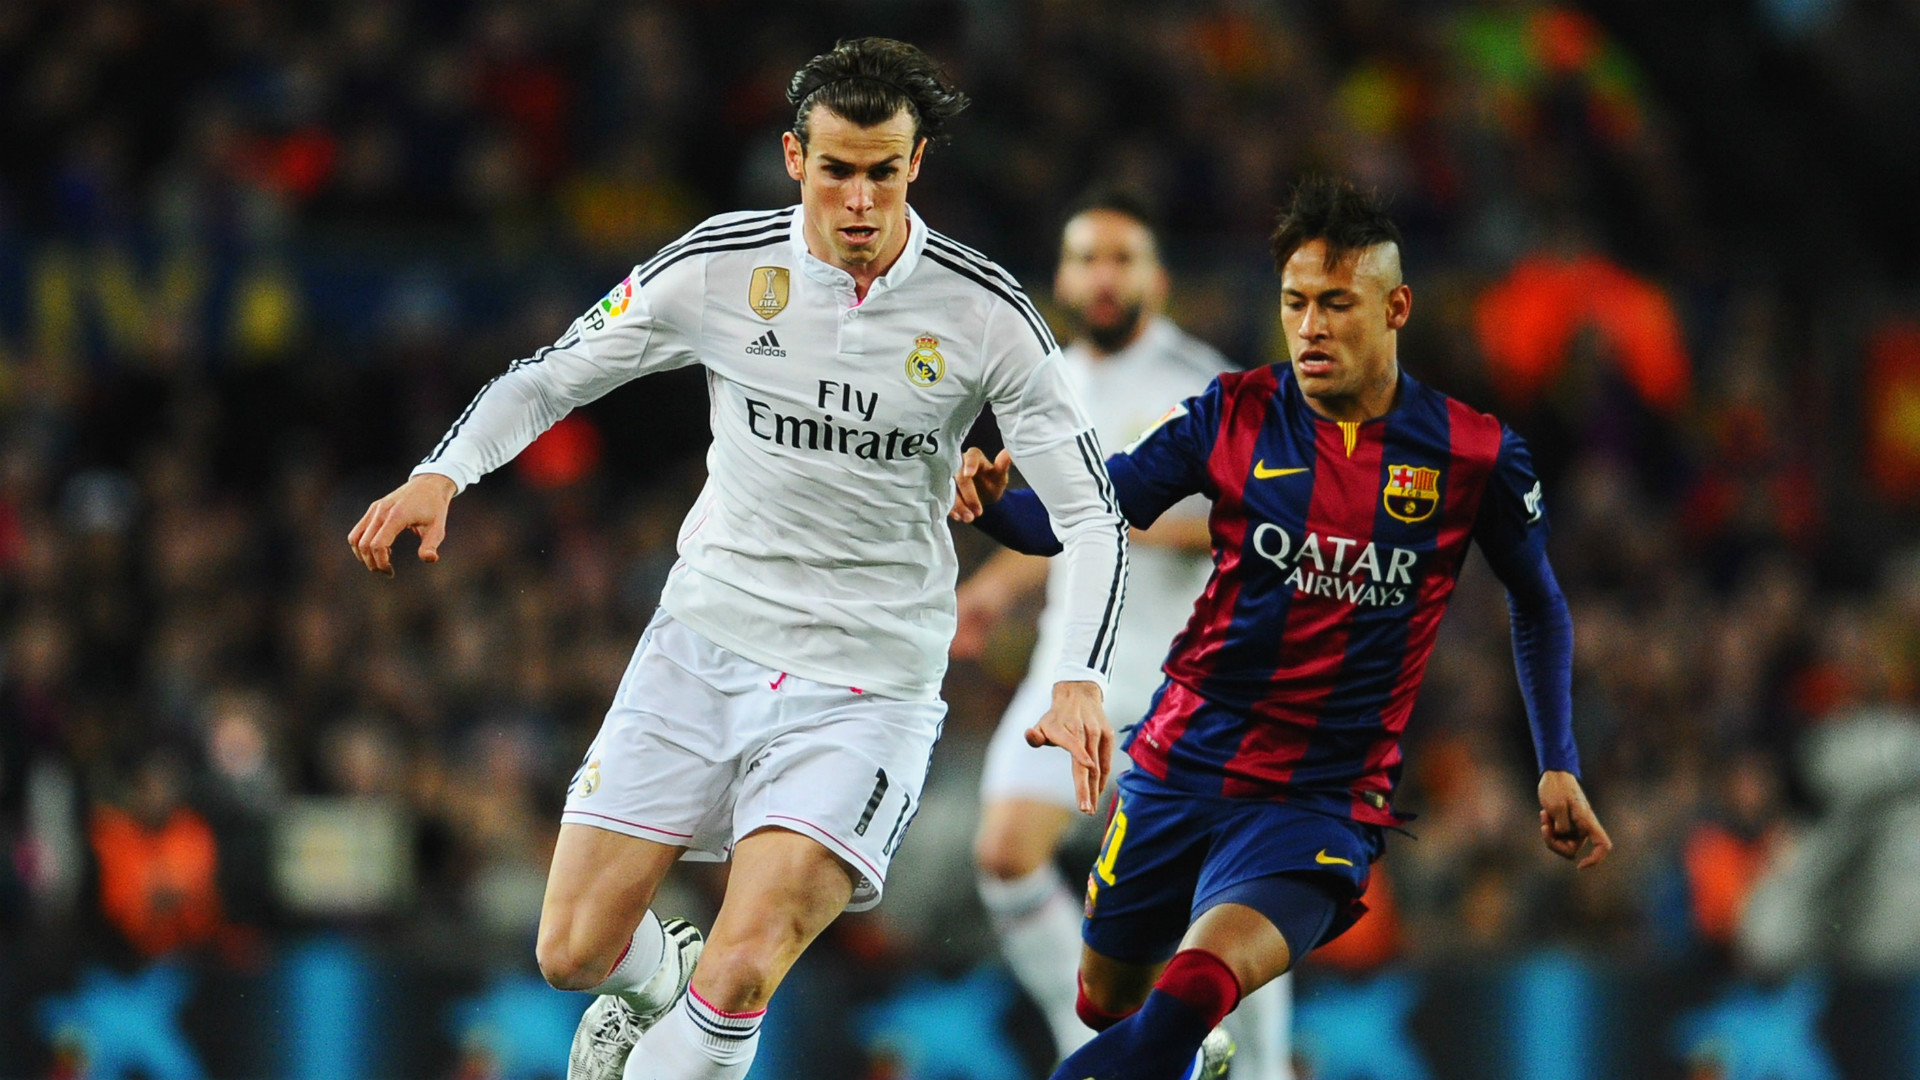 Neymar Gareth Bale Barcelona Real Madrid La Liga